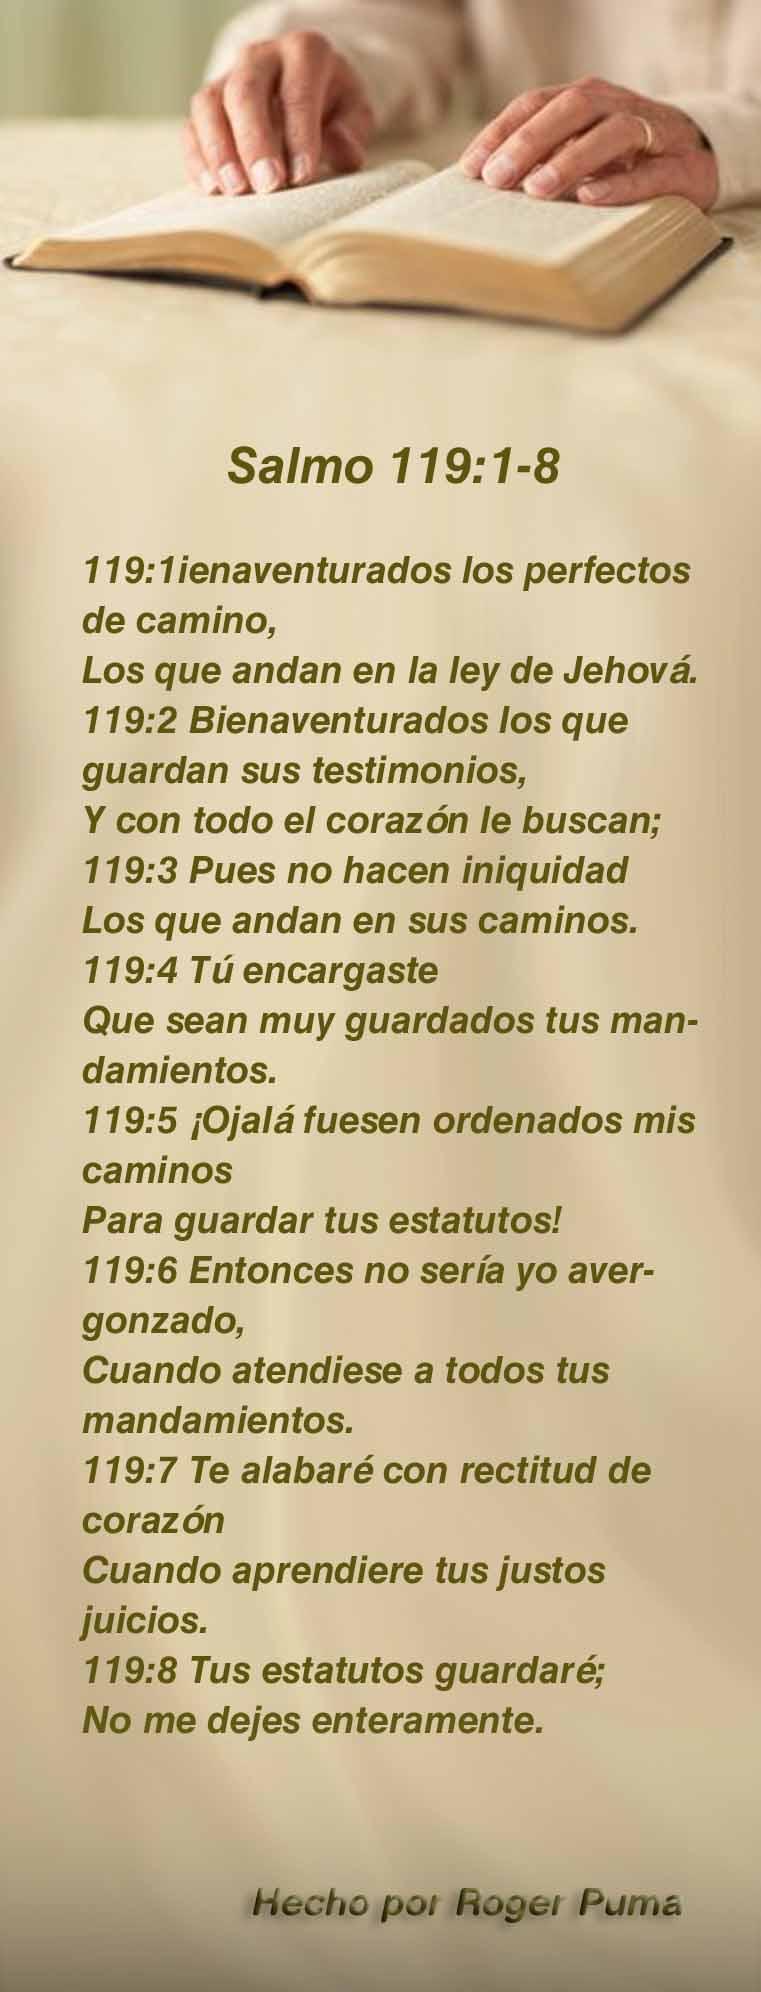 La Biblia Salmo 91     Edoli Eplom Site50   42512 Salmo 91 De La